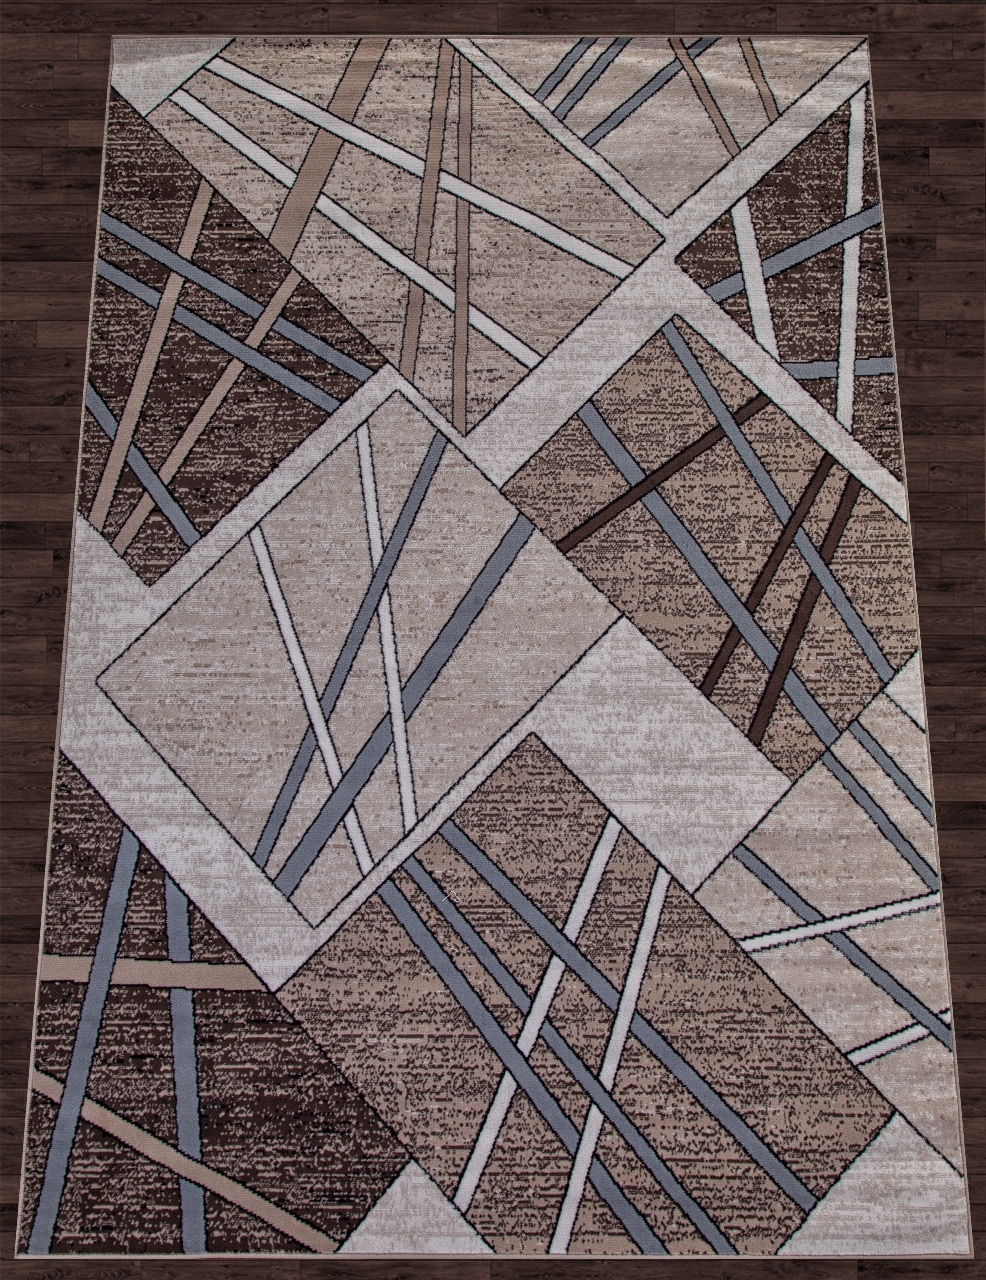 Ковер D487 - BEIGE-BROWN - Прямоугольник - коллекция SIERRA